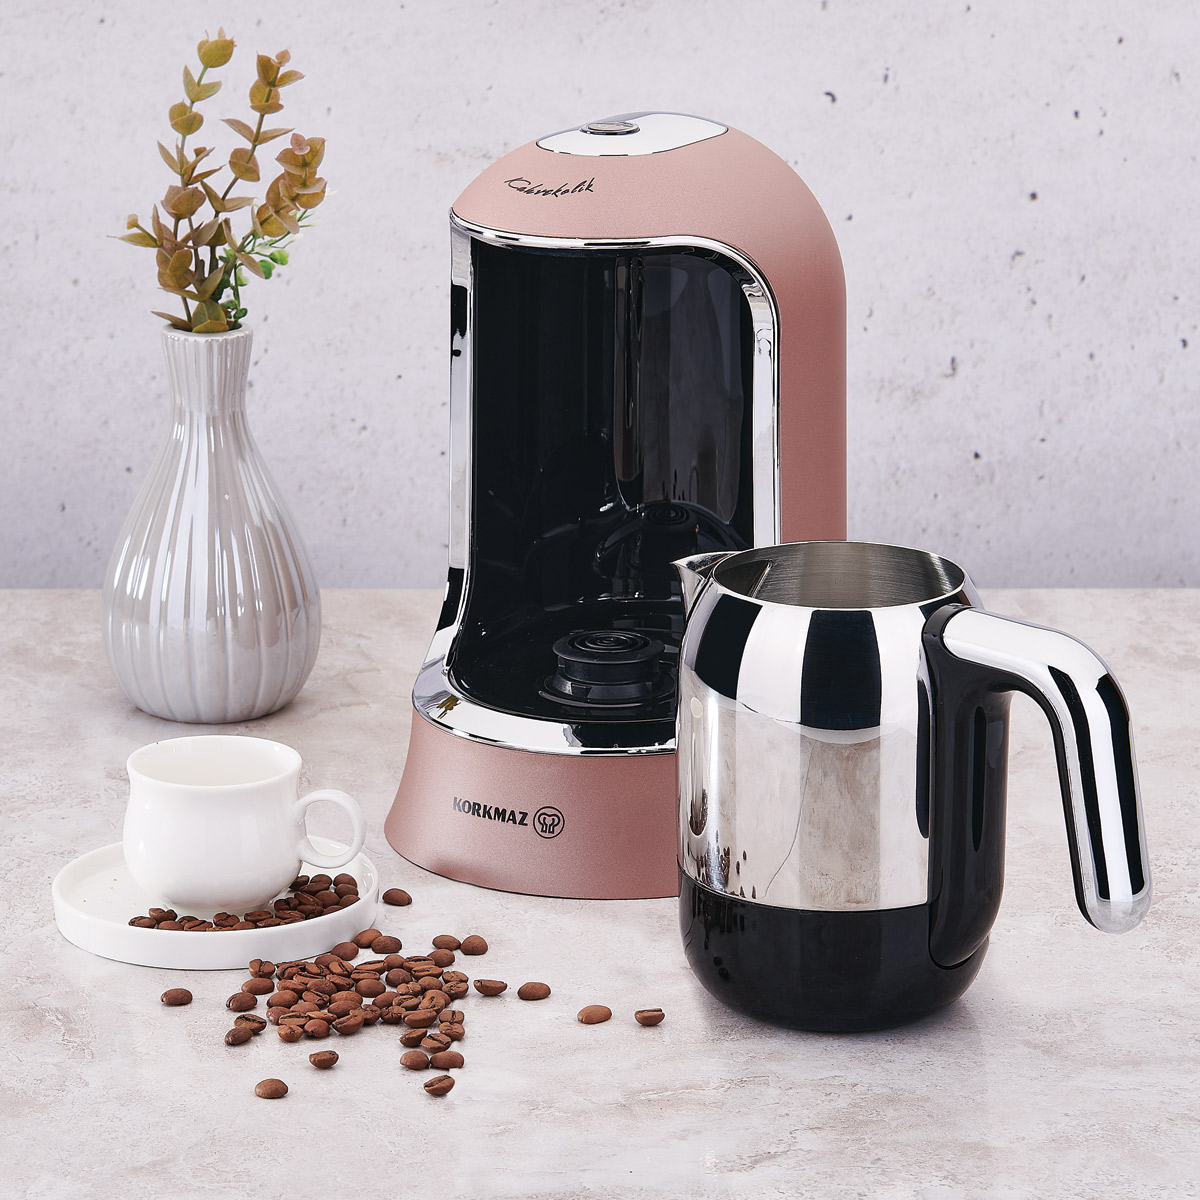 Korkmaz Kahvekolik Rosagold/Krom Otomatik Kahve Makinesi